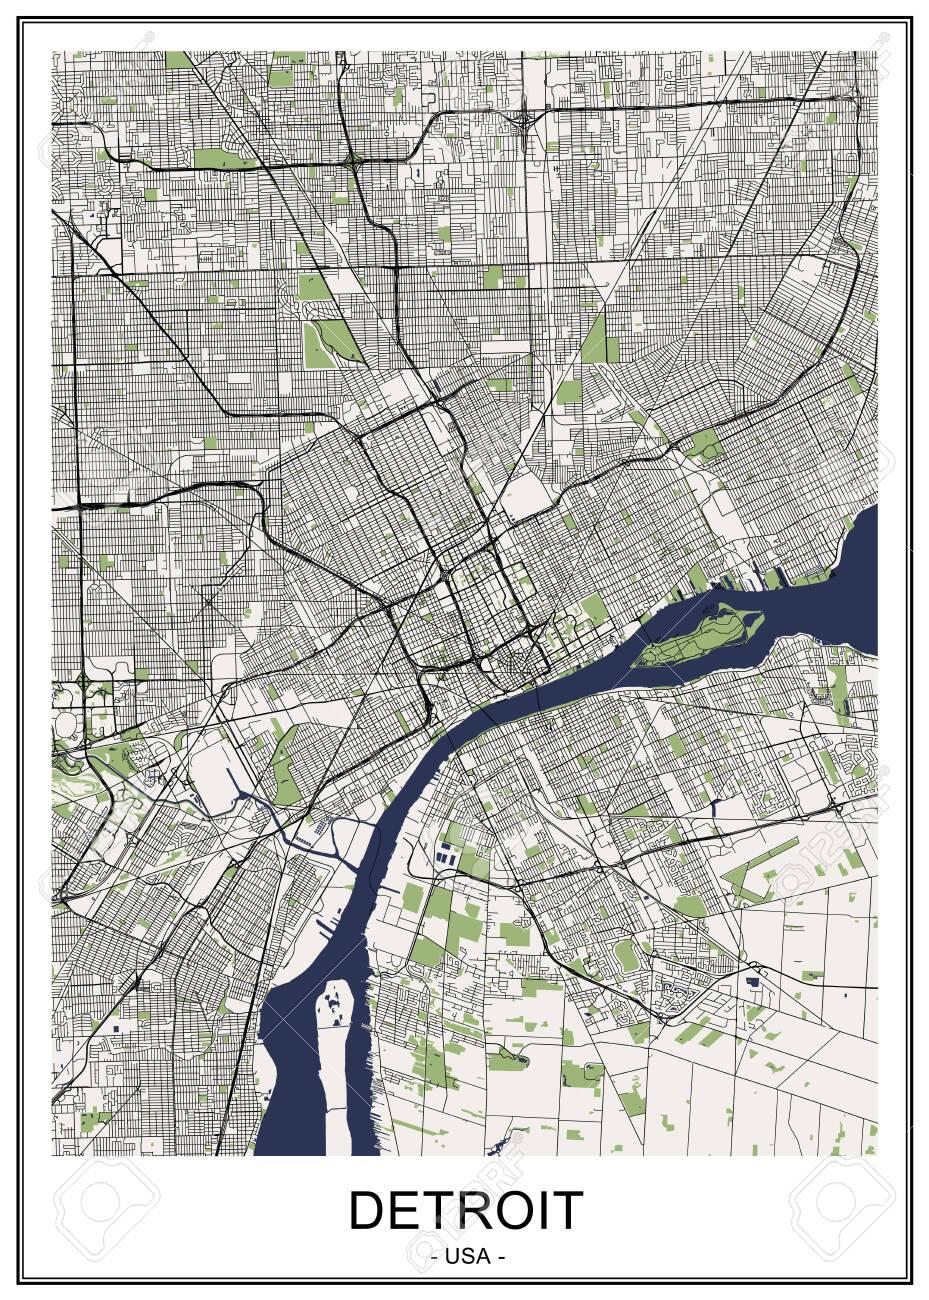 vector map of the city of Detroit, Michigan, USA on map usa dallas, map usa indianapolis, map usa new orleans, map usa san francisco, map usa boston, map usa chicago, map usa san antonio, map usa cleveland, map usa san diego, map usa new york, map usa baltimore, map usa philadelphia, map usa michigan, map usa atlanta,